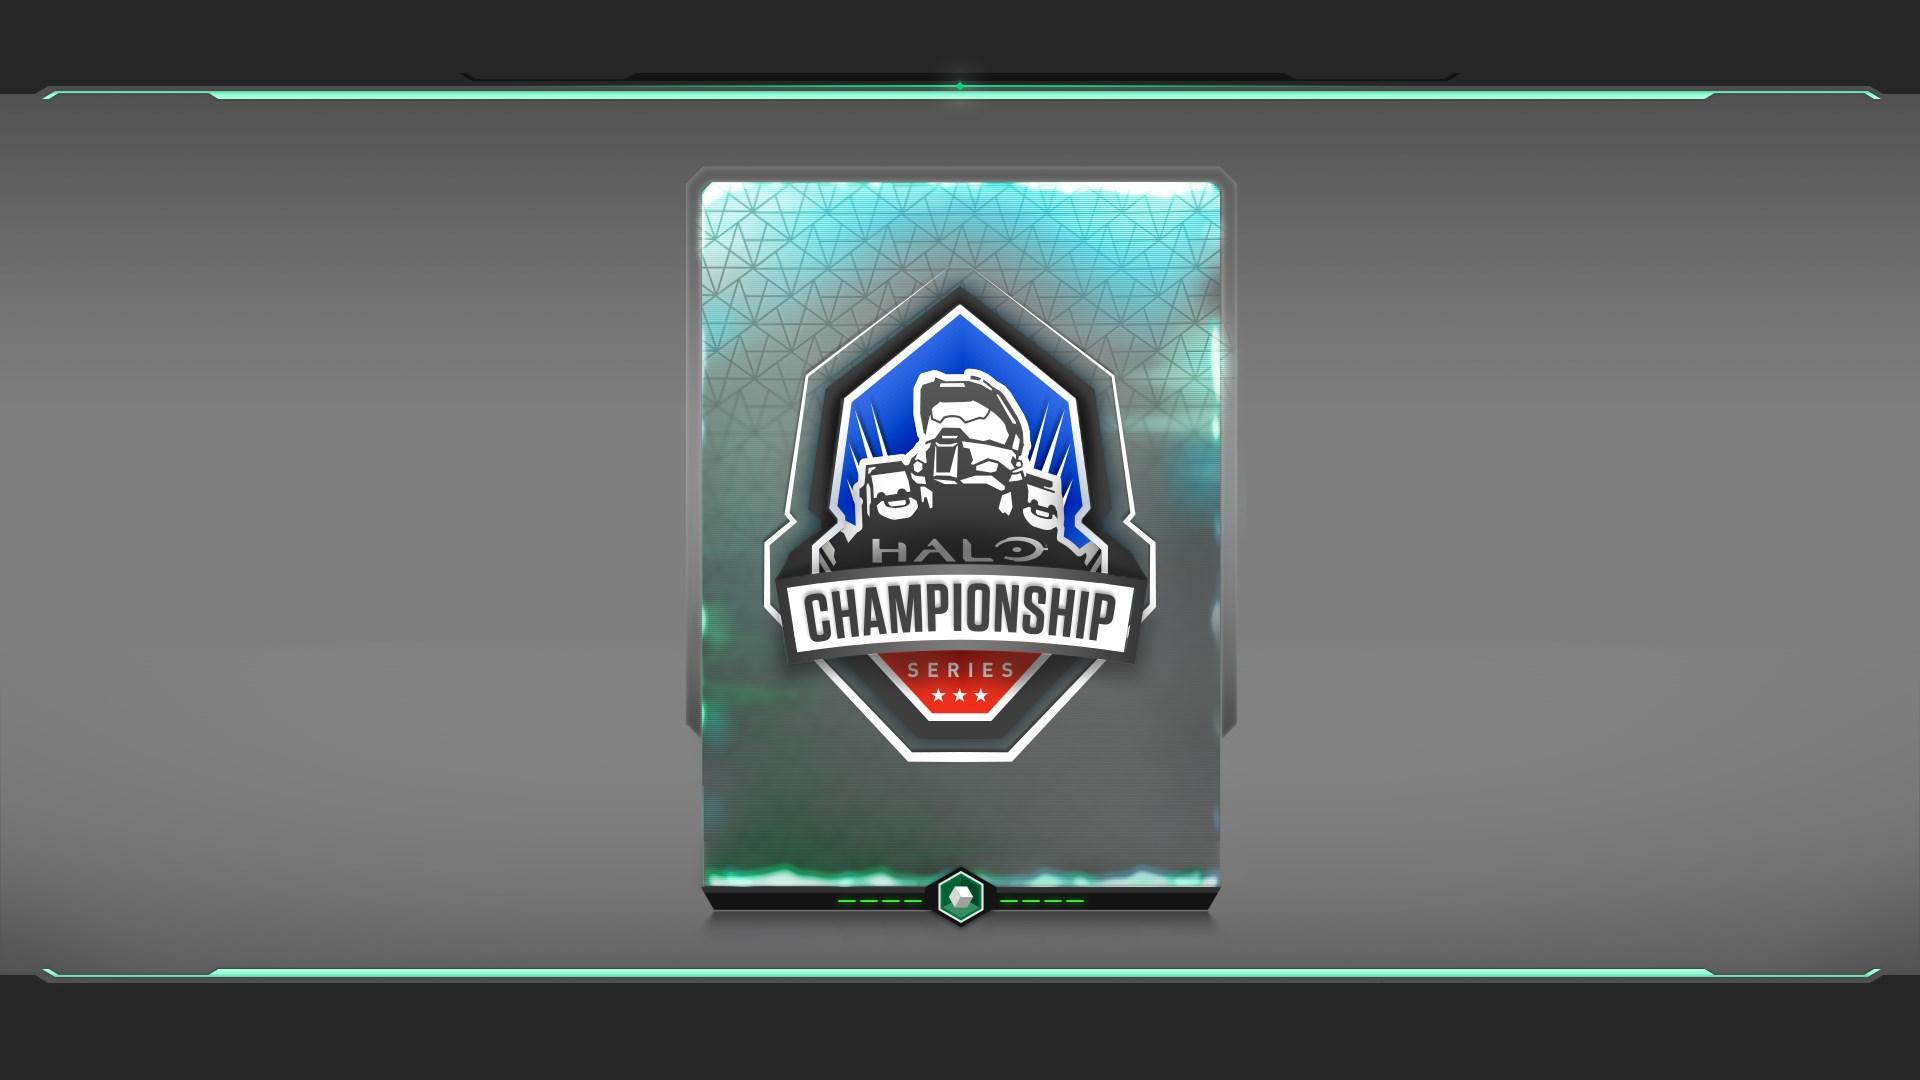 Halo 5: Guardians – Halo Championship Series Premium REQ Pack